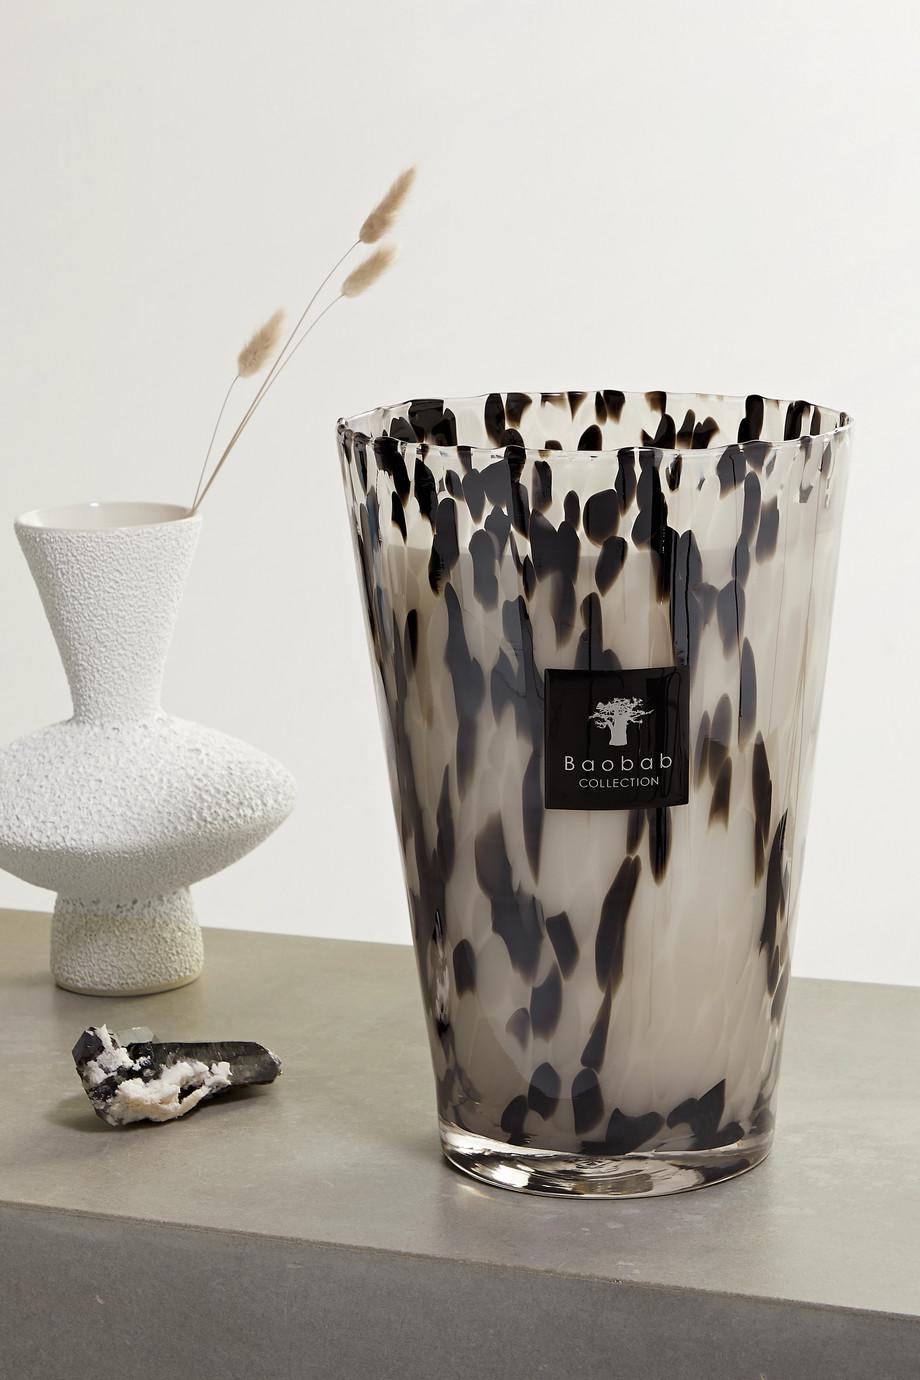 Baobab Collection Bougie parfumée Black Pearls Maxi Max 16, 6,4 kg